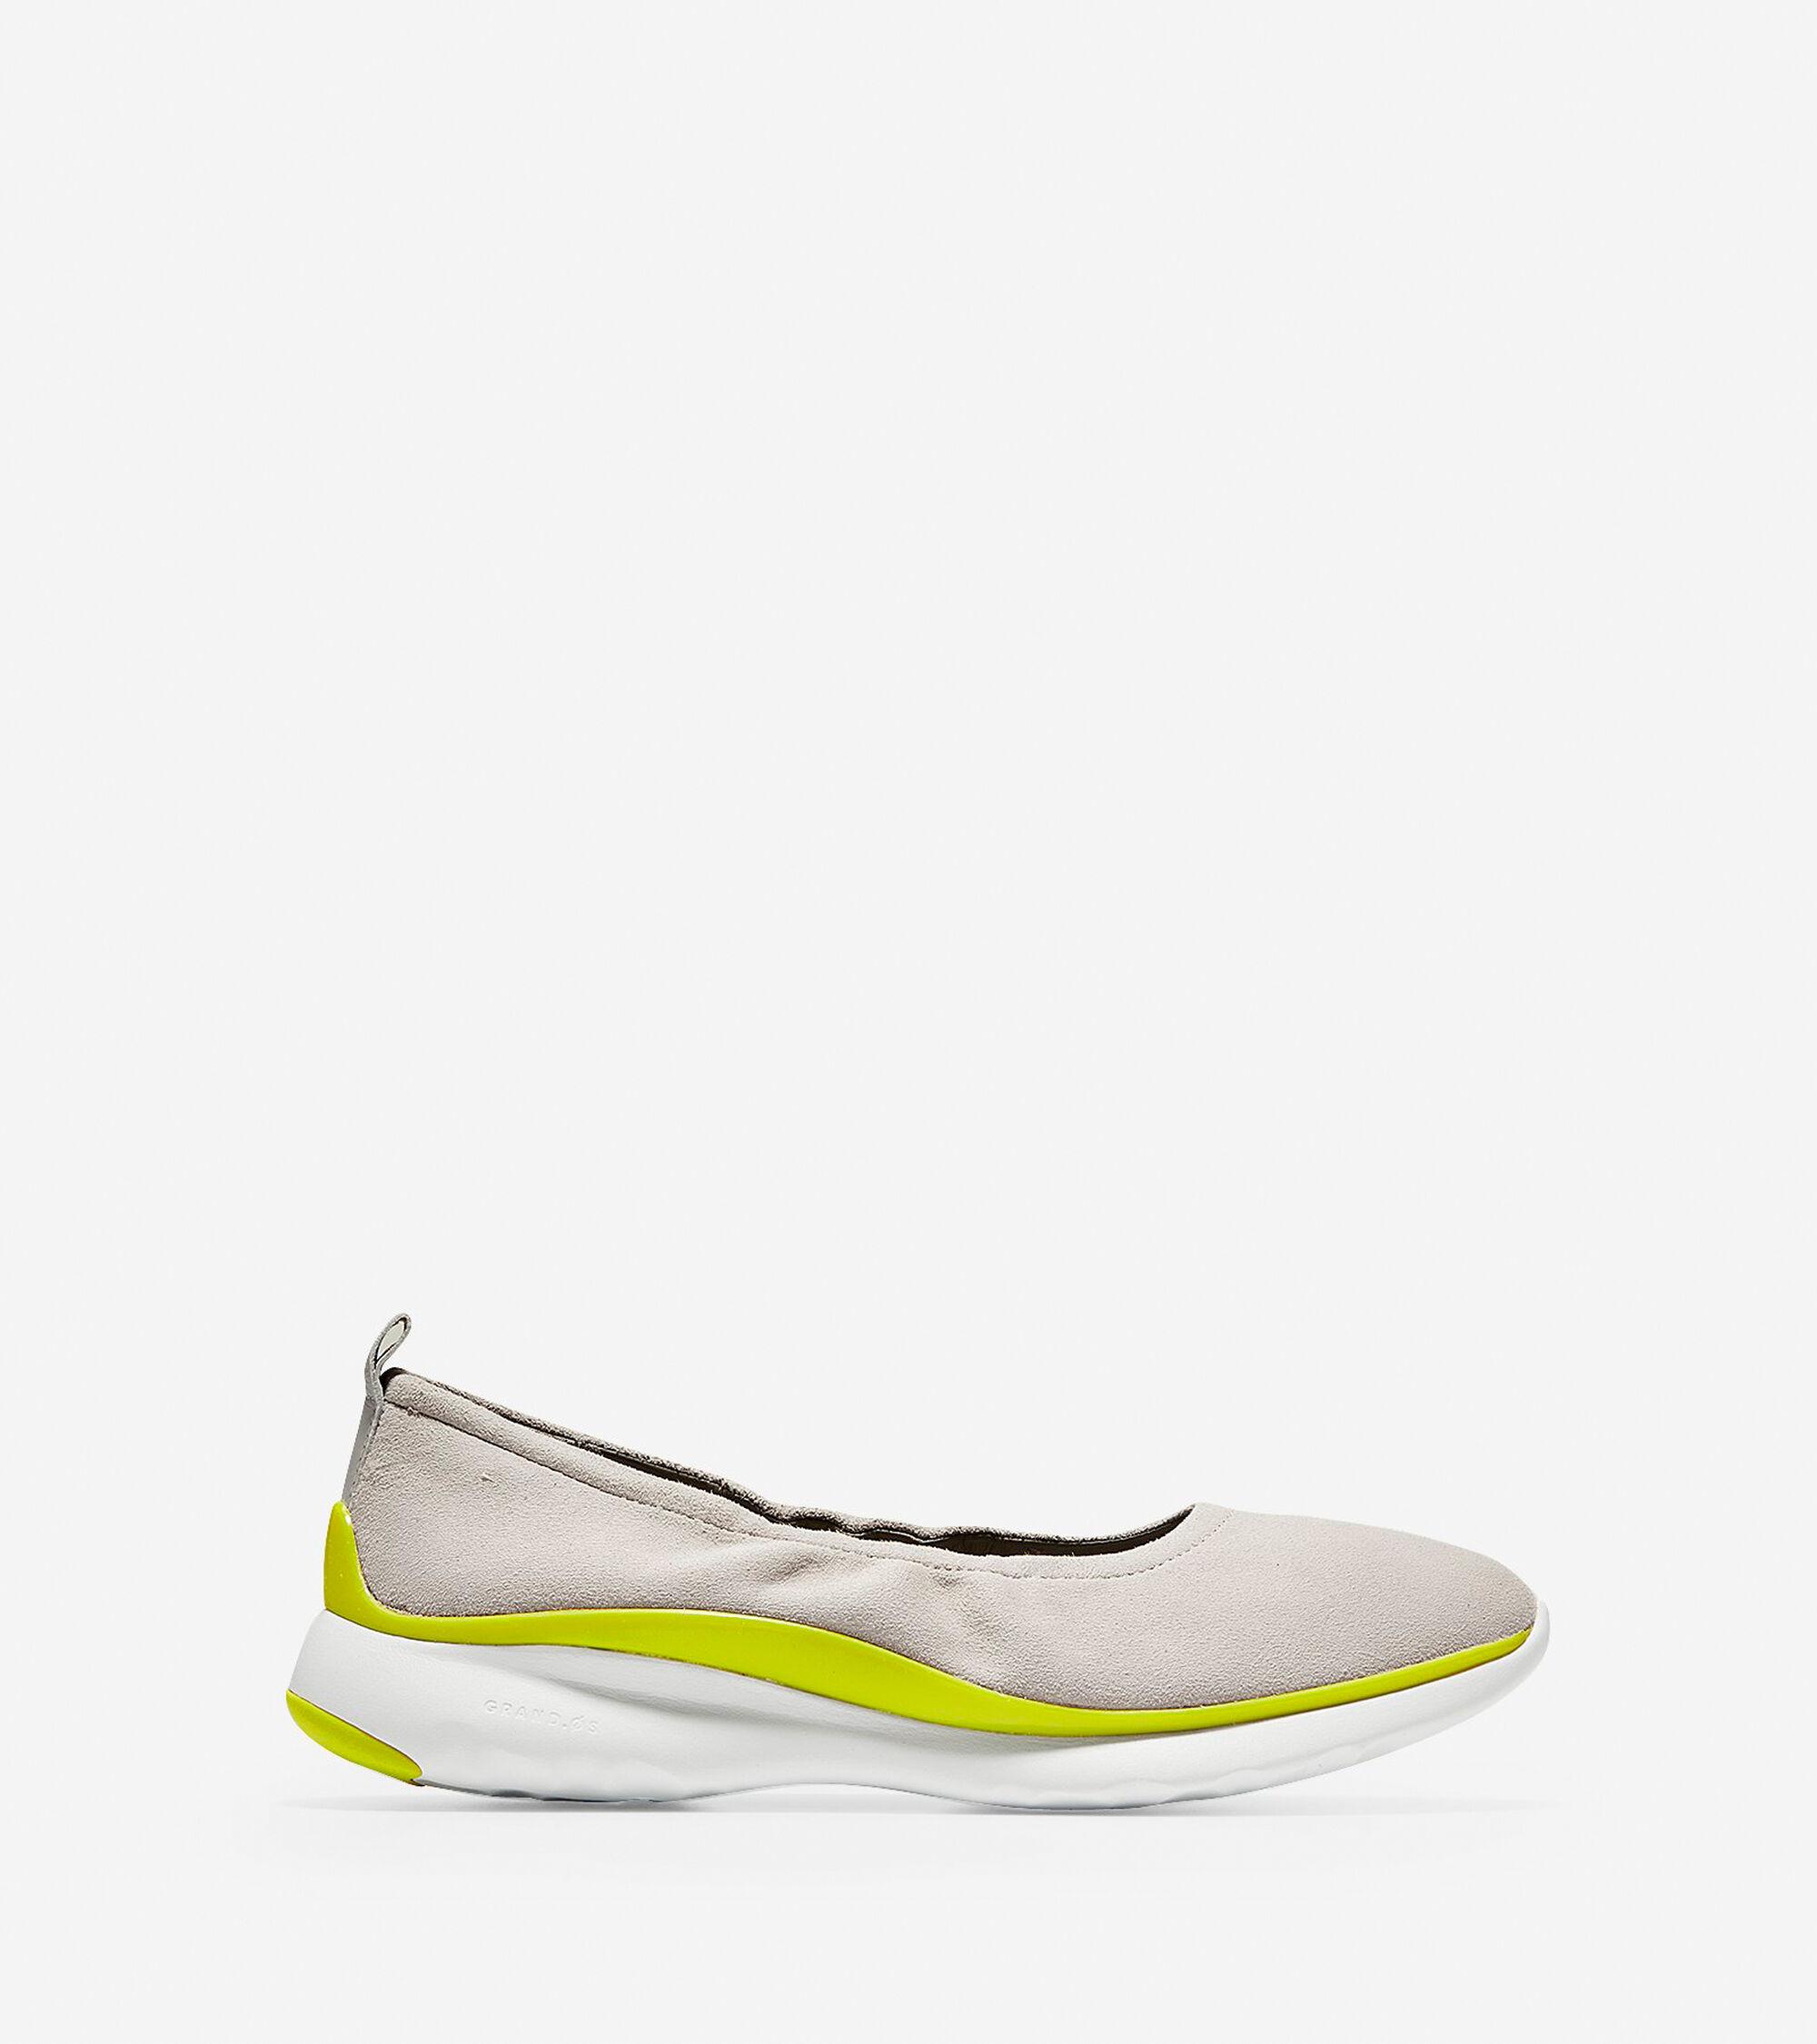 d134eecbb1f Women s 3.ZEROGRAND Ruched Slip-On Ballet Flats in Dove